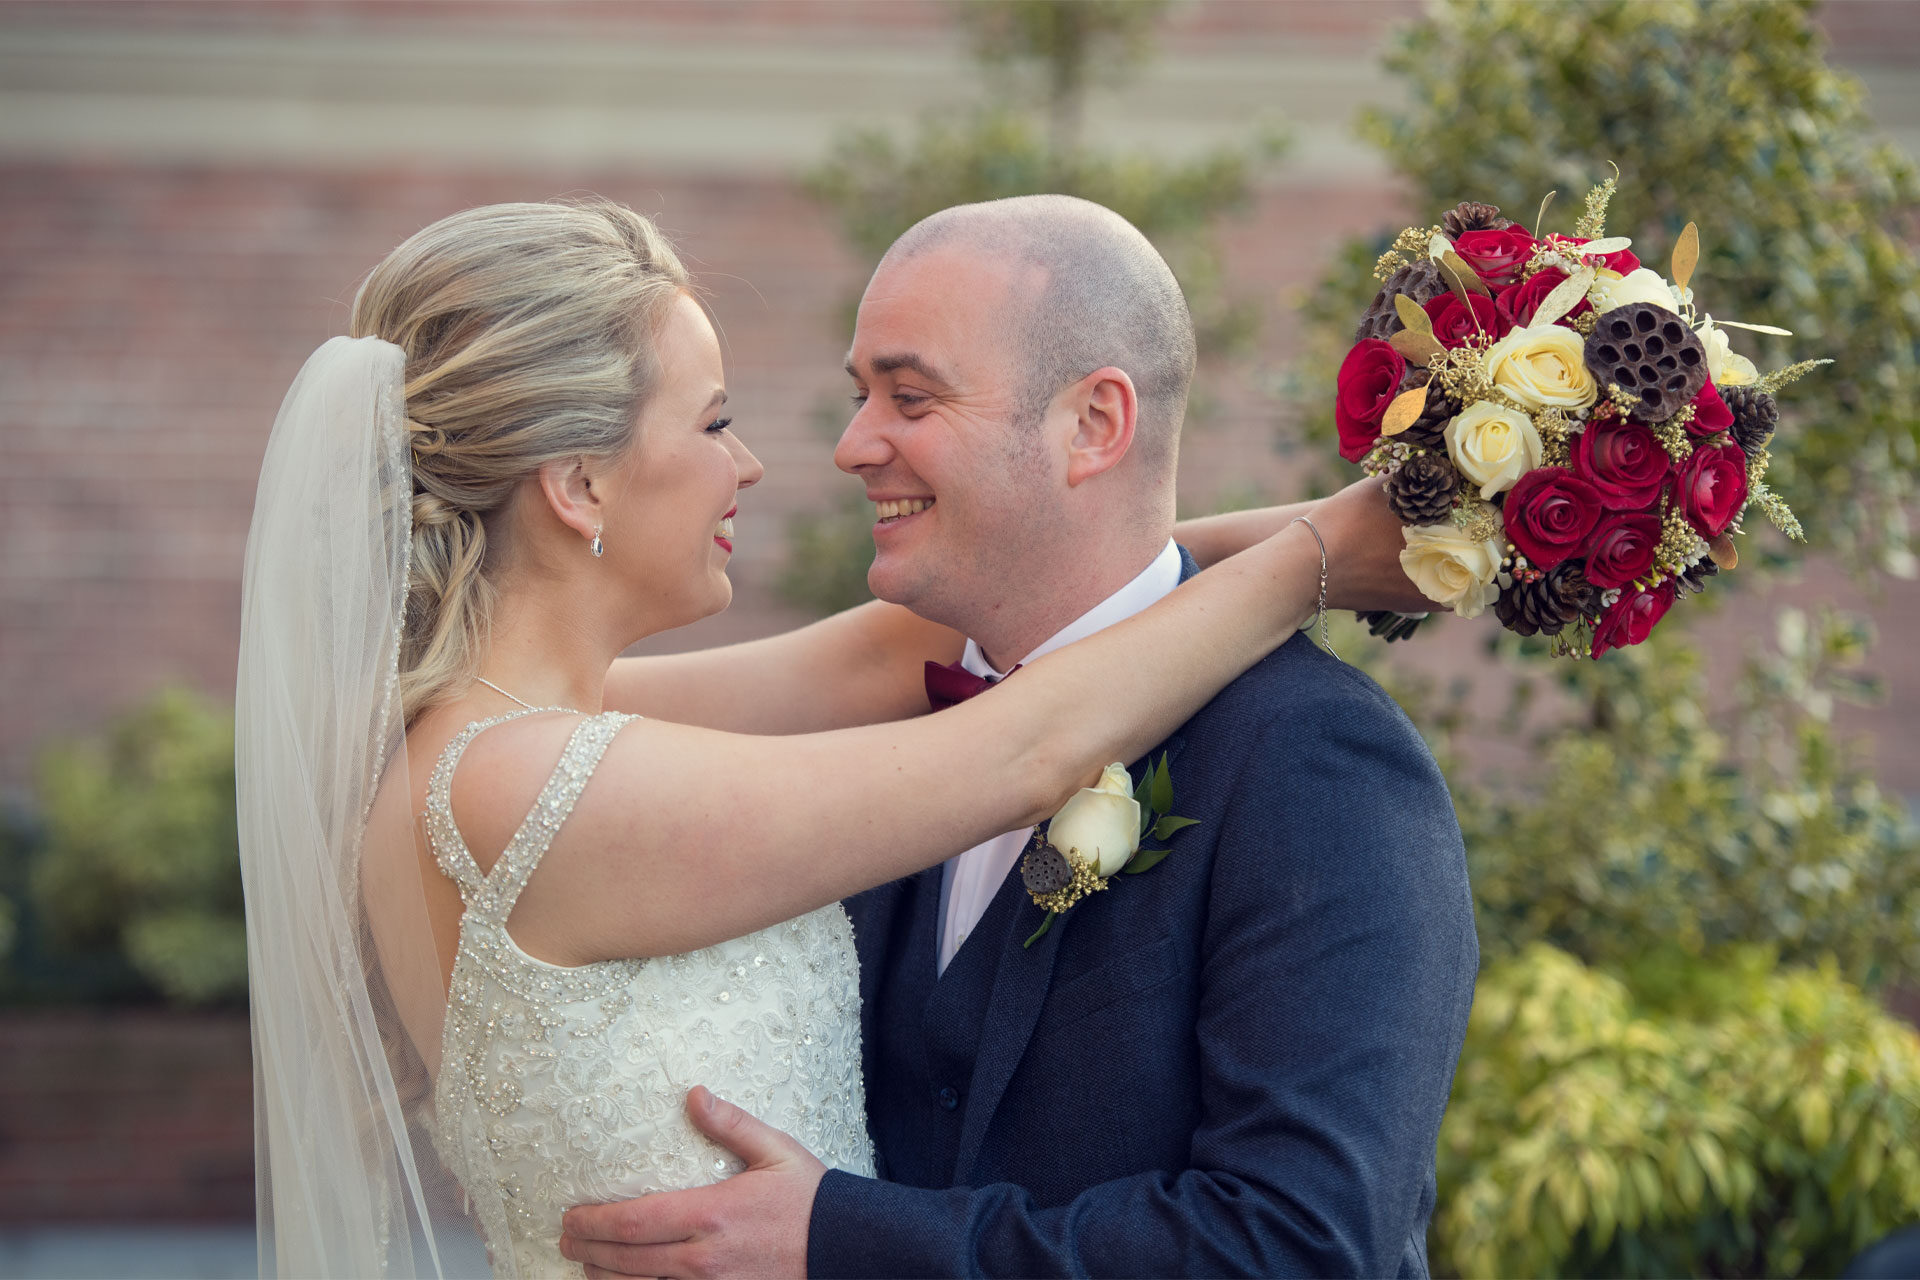 Photo of Tayna and Niall on their wedding day, captured at Cavan Crystal Hotel, Co. Cavan, Ireland.